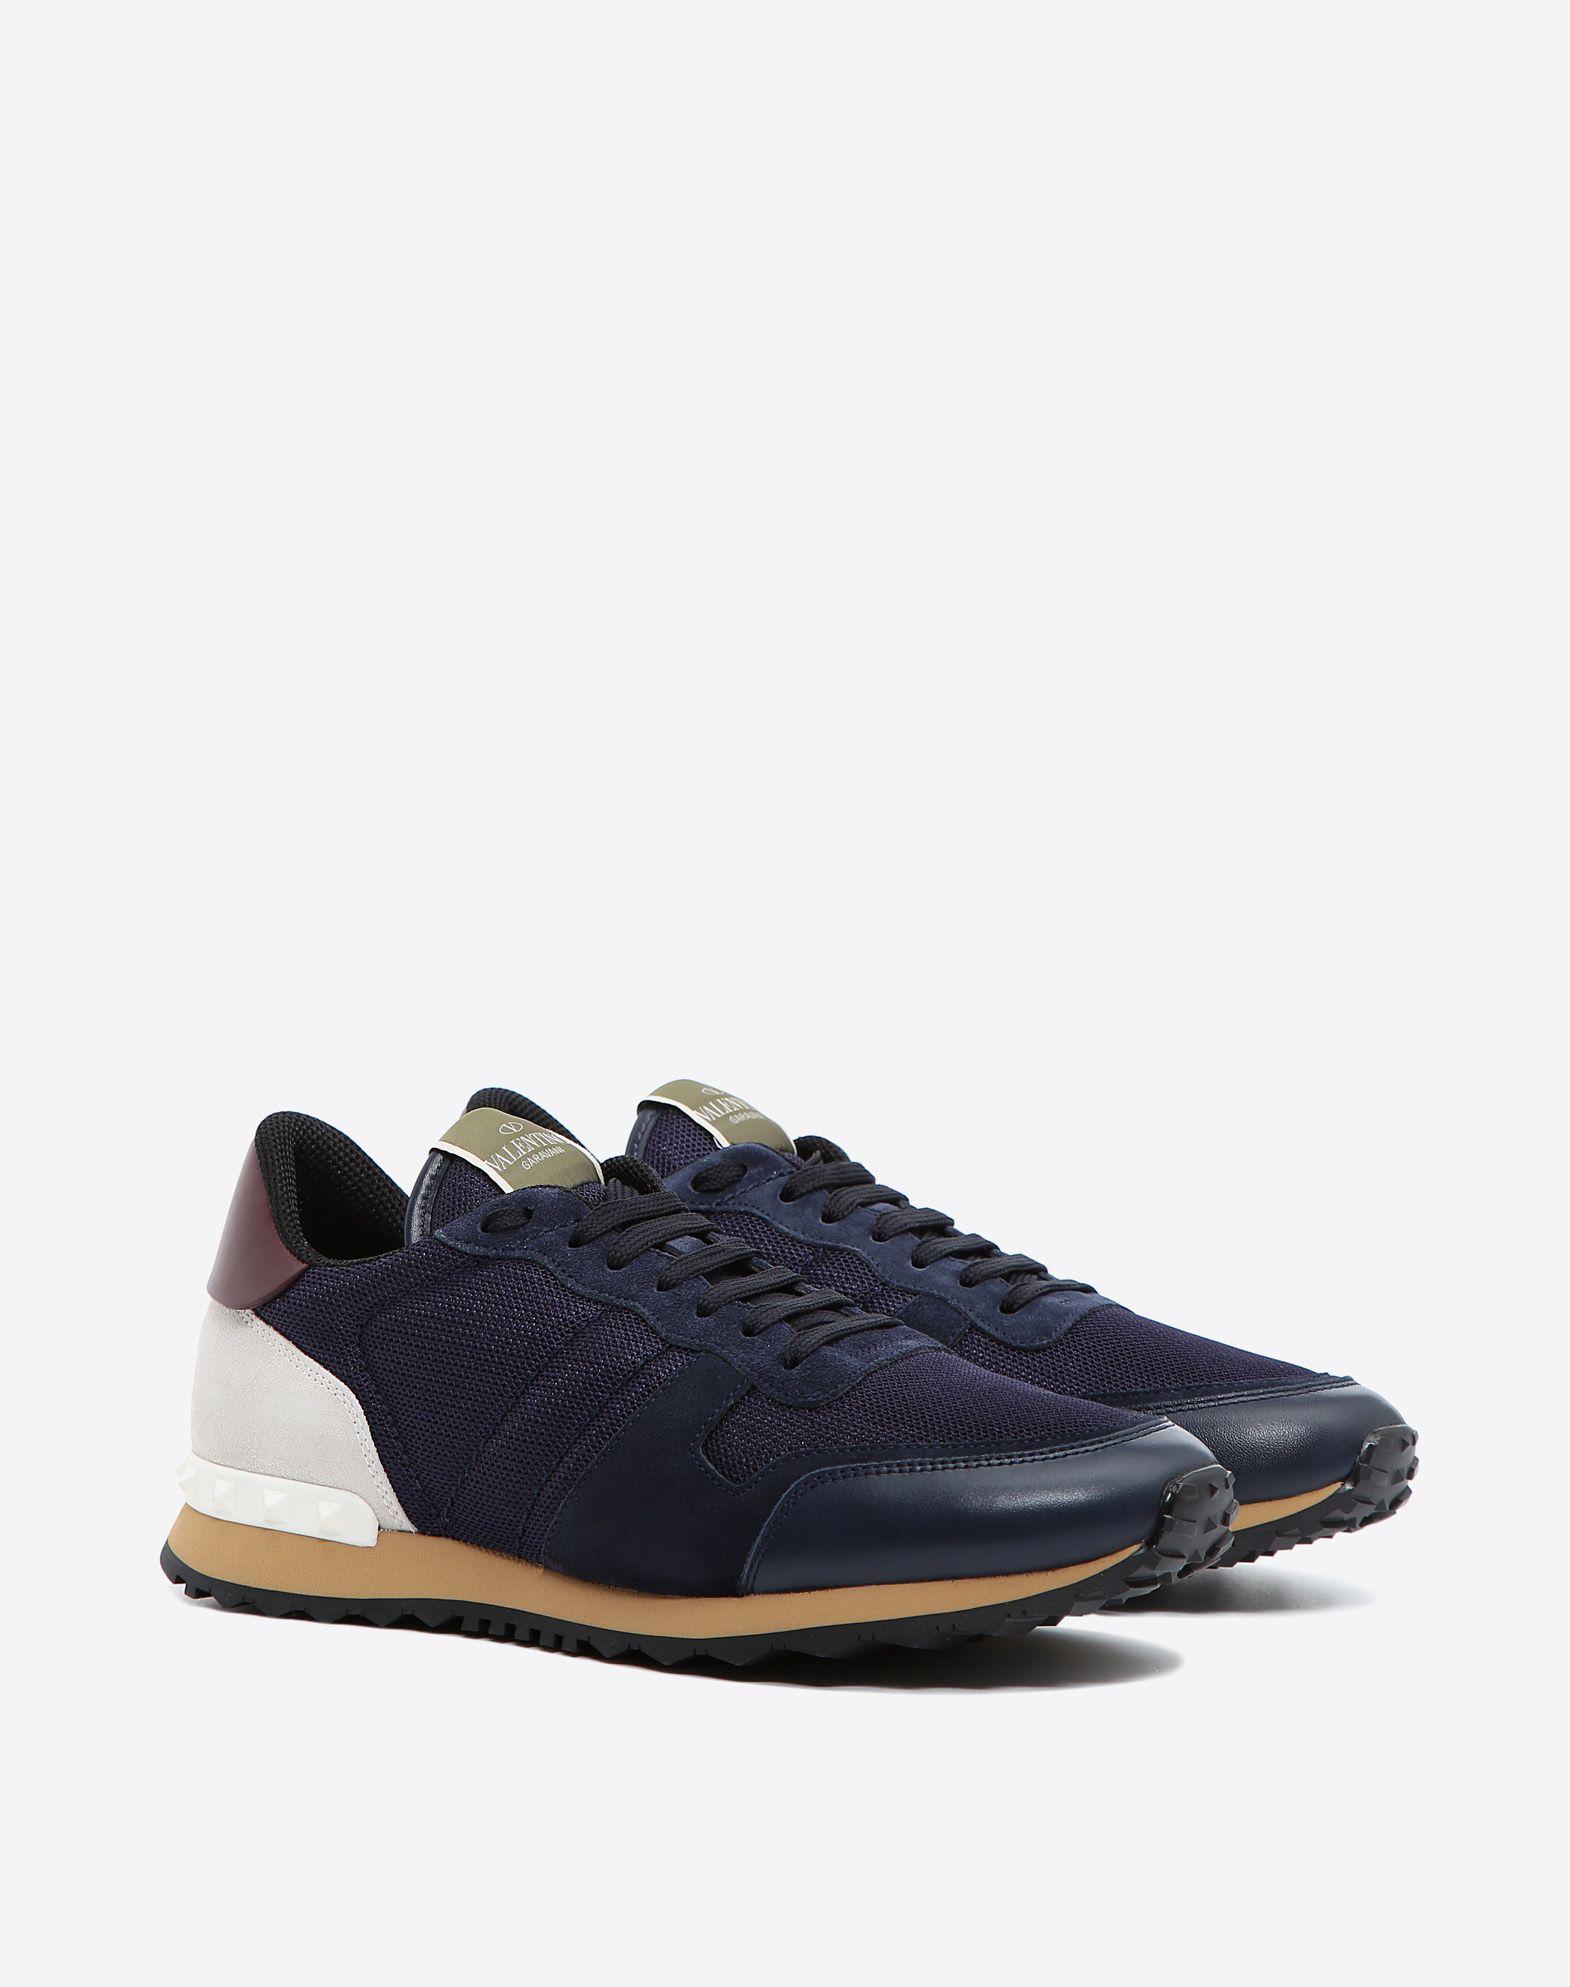 VALENTINO GARAVANI UOMO MY2S0723TCV H07 Sneaker U r